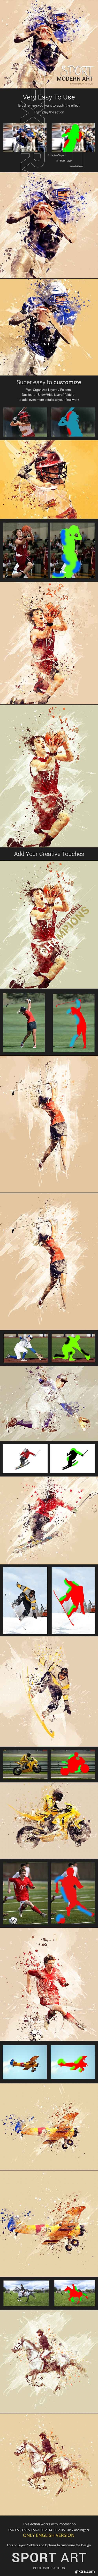 GraphicRiver - Sport Modern Art Photoshop Action 21465778